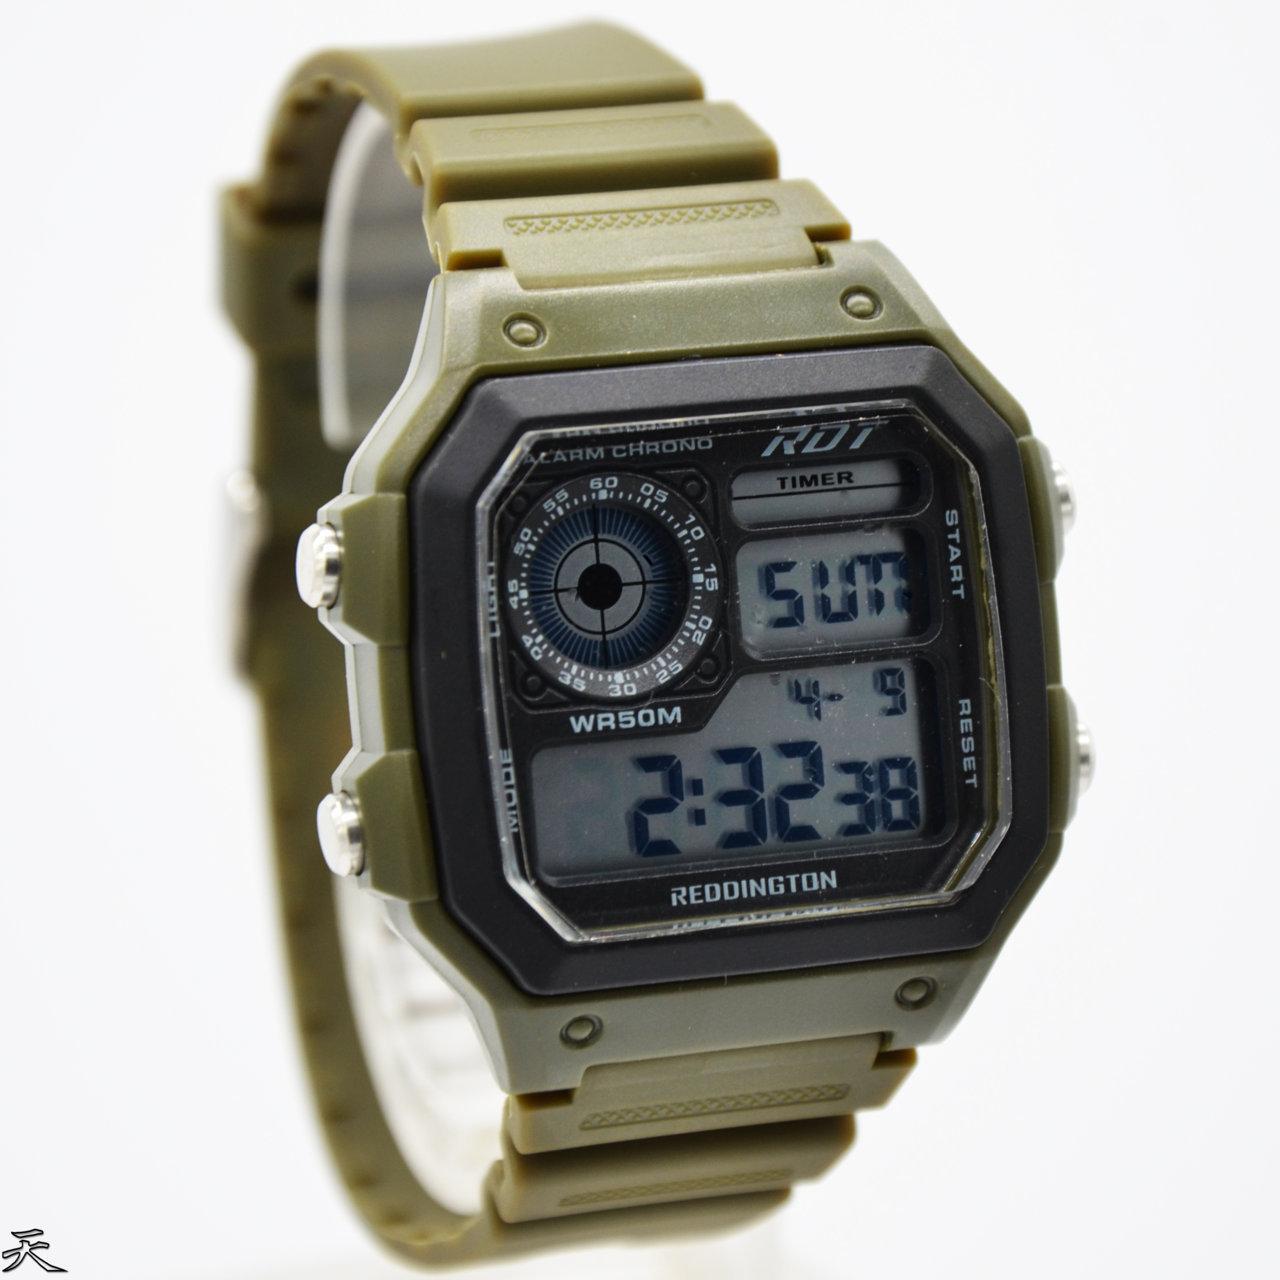 Jam Tangan Pria Reddington Digital RD6099 D39H90HJUARM - Rubber Strap - Hijau Army